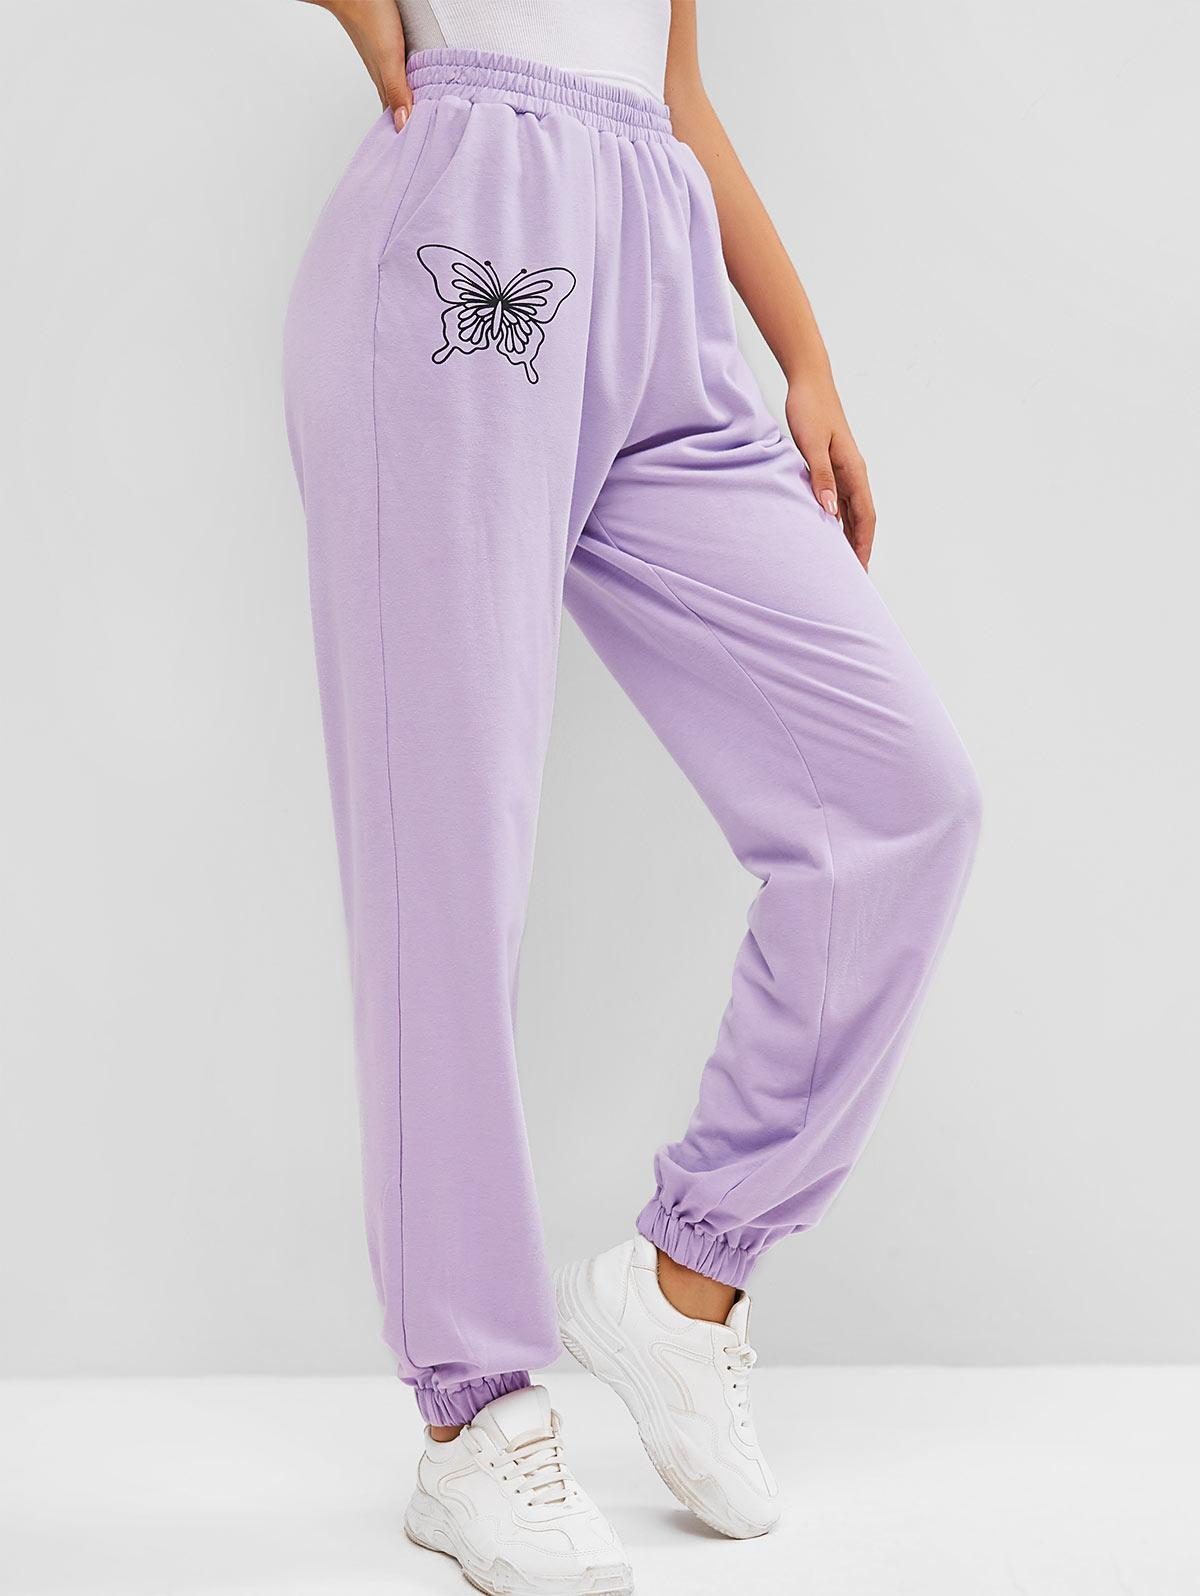 ZAFUL Pocket High Waisted Butterfly Print Sweatpants